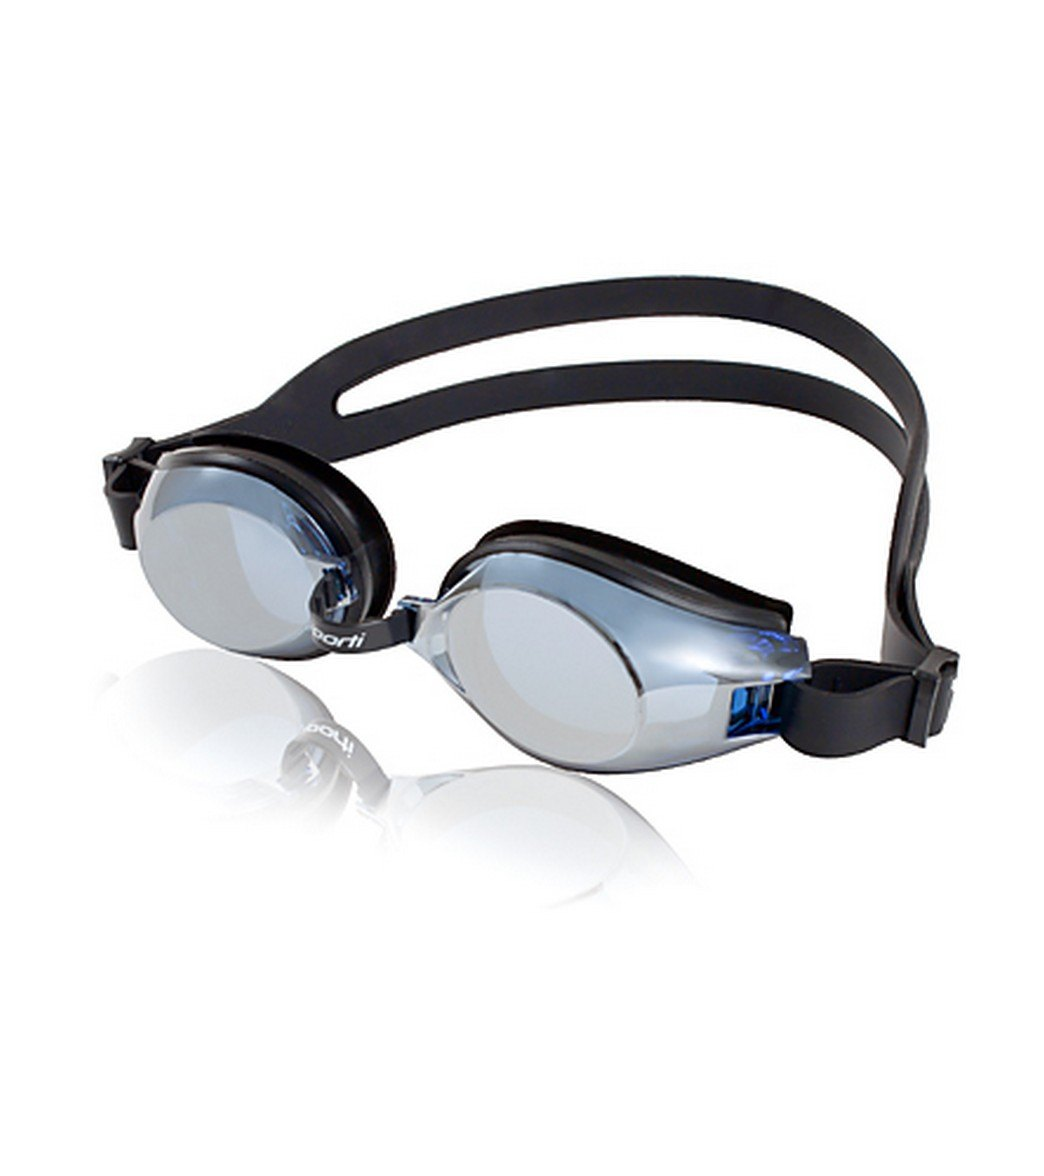 c37dcef5c87 Sporti Antifog Plus Mirrored Goggle at SwimOutlet.com